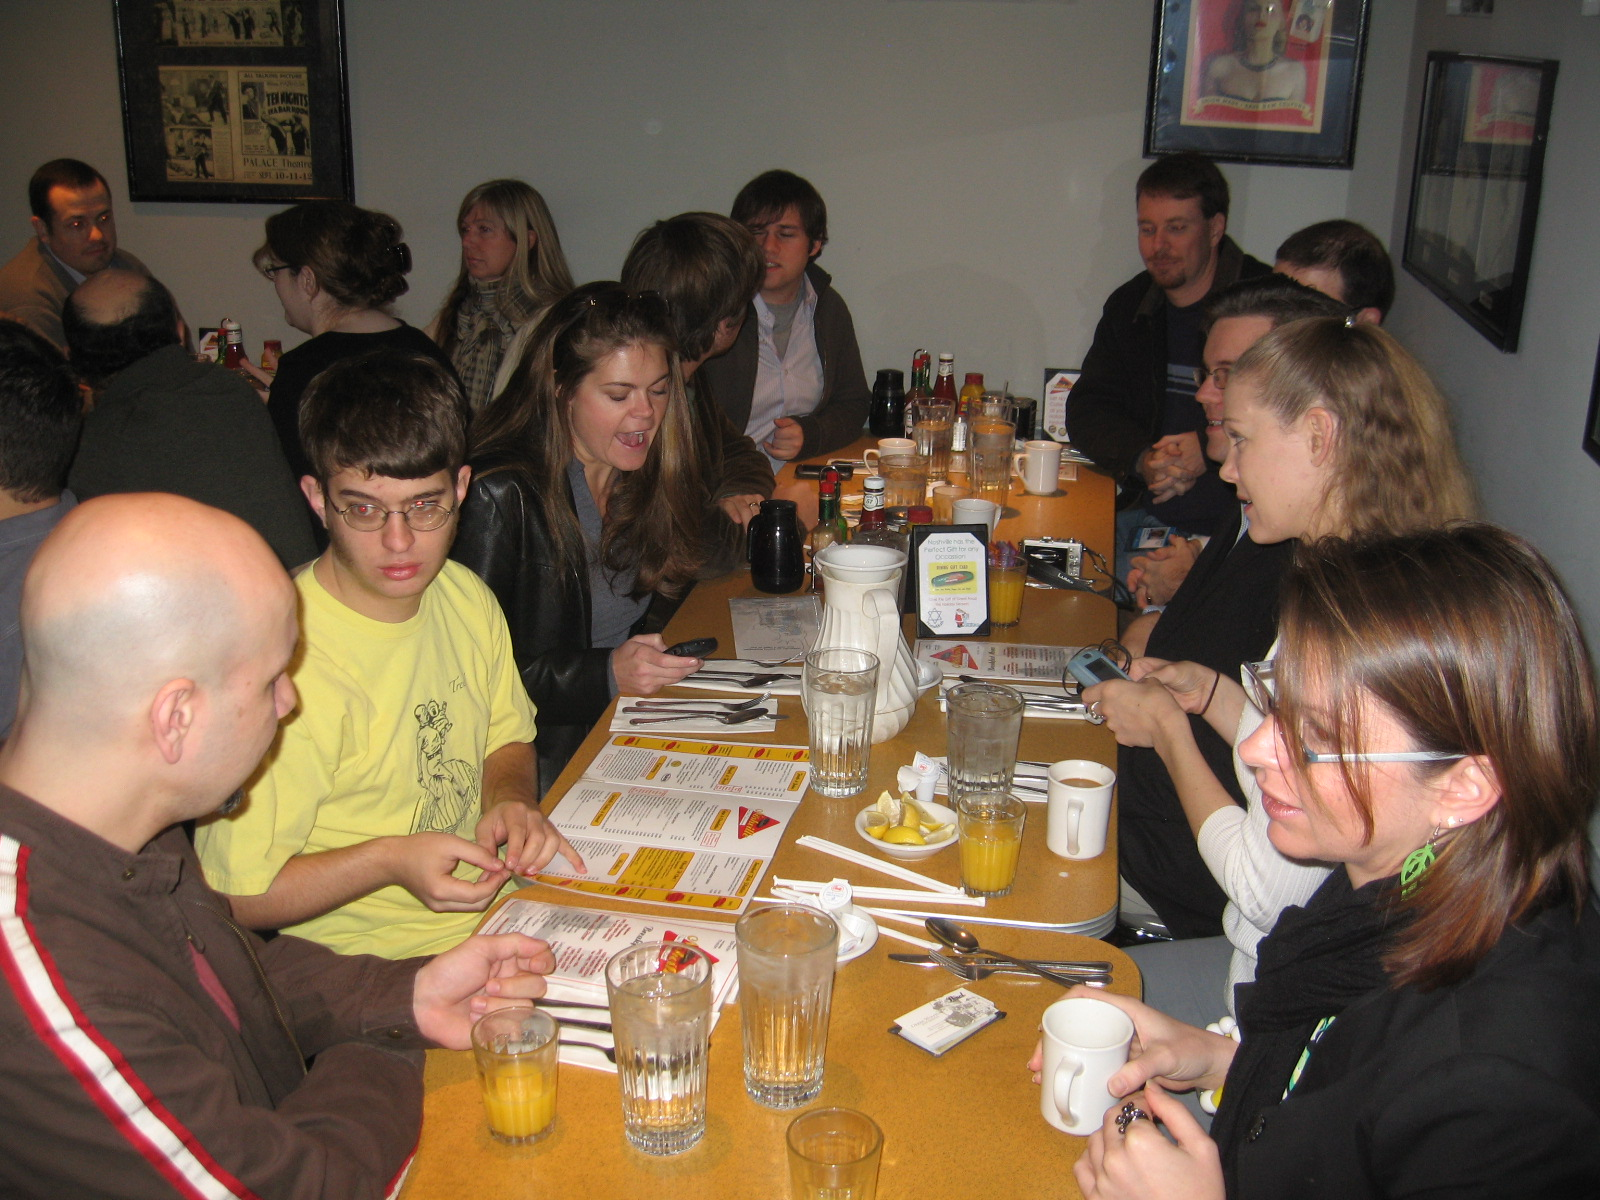 nashville-geek-breakfast---november_3046865936_o.jpg